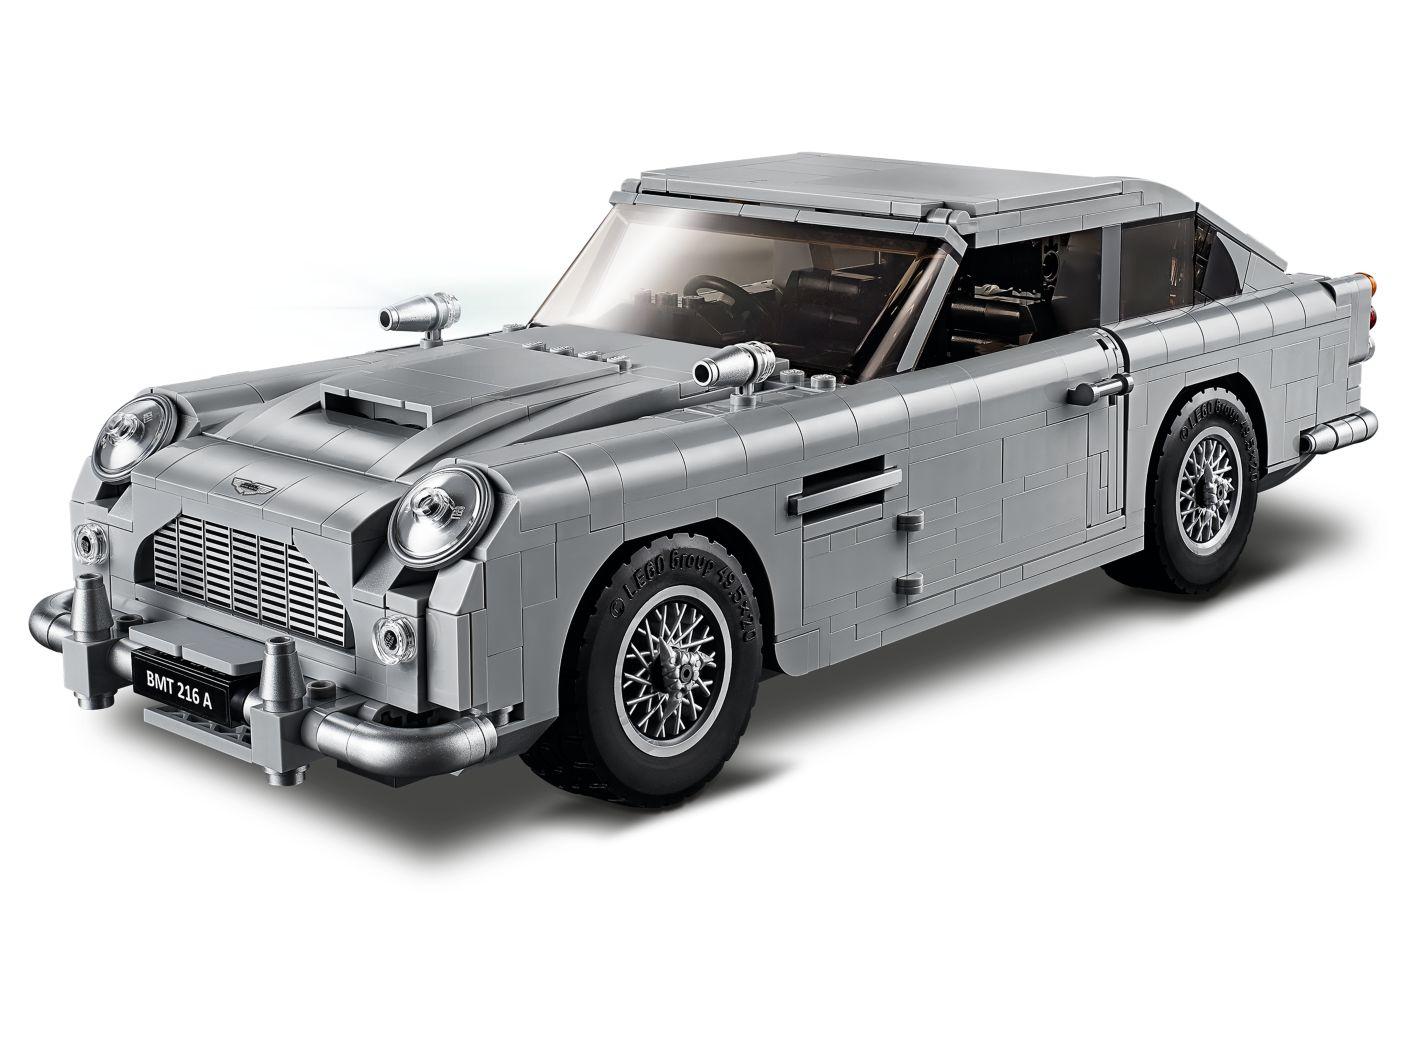 james bond™ aston martin db5 - 10262 | creator expert | lego shop